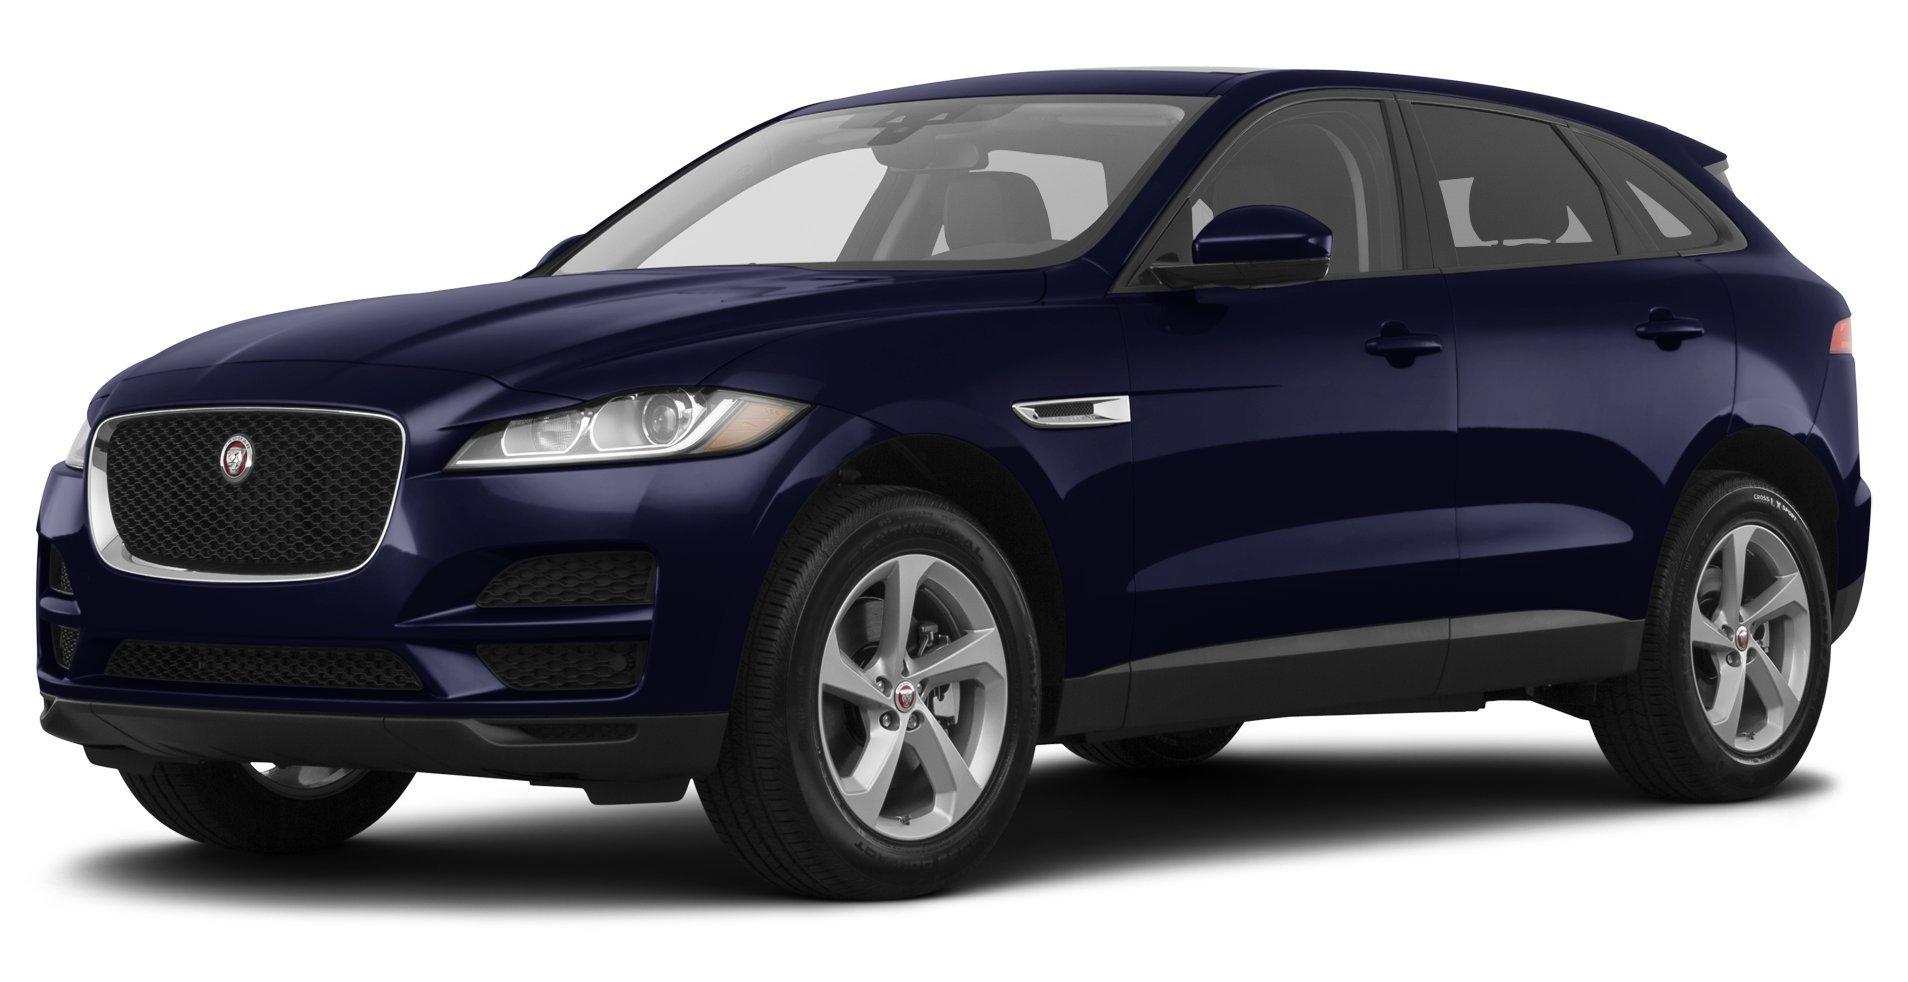 2017 jaguar f pace reviews images and specs vehicles. Black Bedroom Furniture Sets. Home Design Ideas